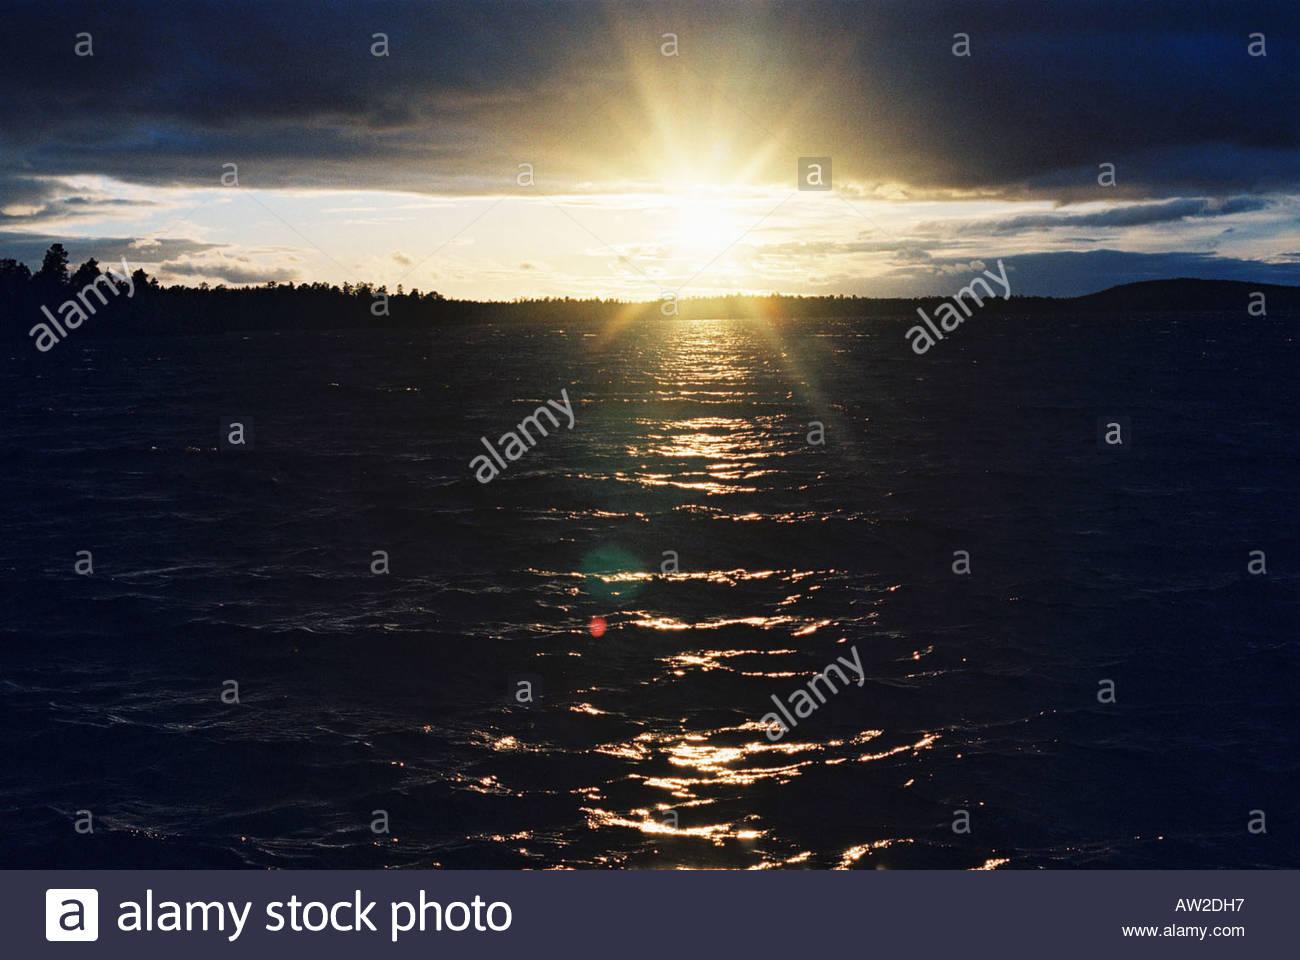 Lake Inari Lapland Finland - Stock Image